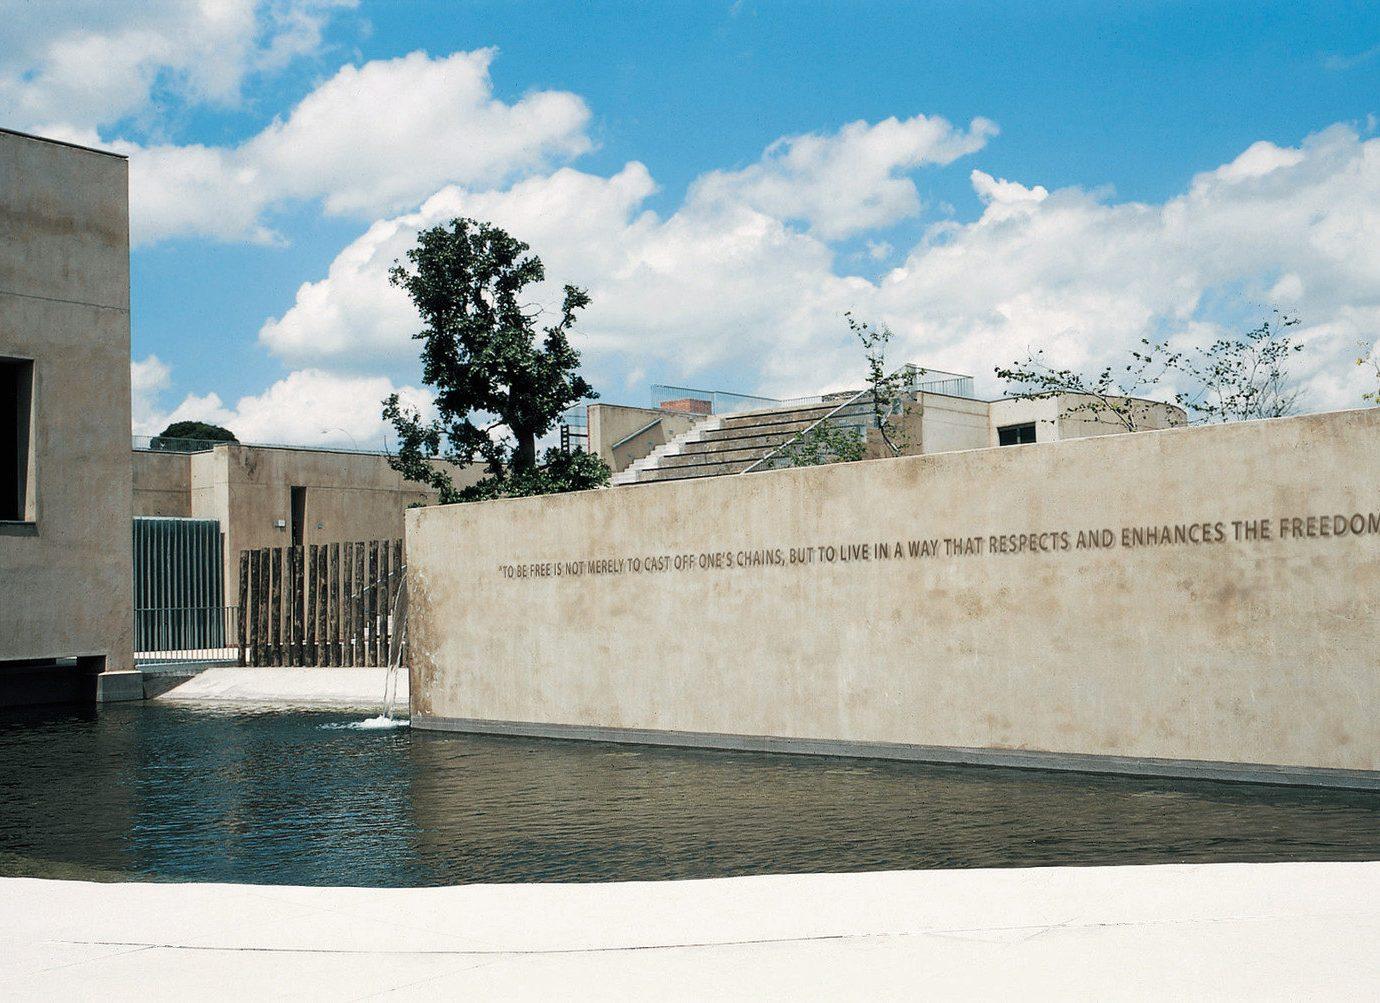 Trip Ideas building outdoor blue Architecture wall facade estate home concrete cement